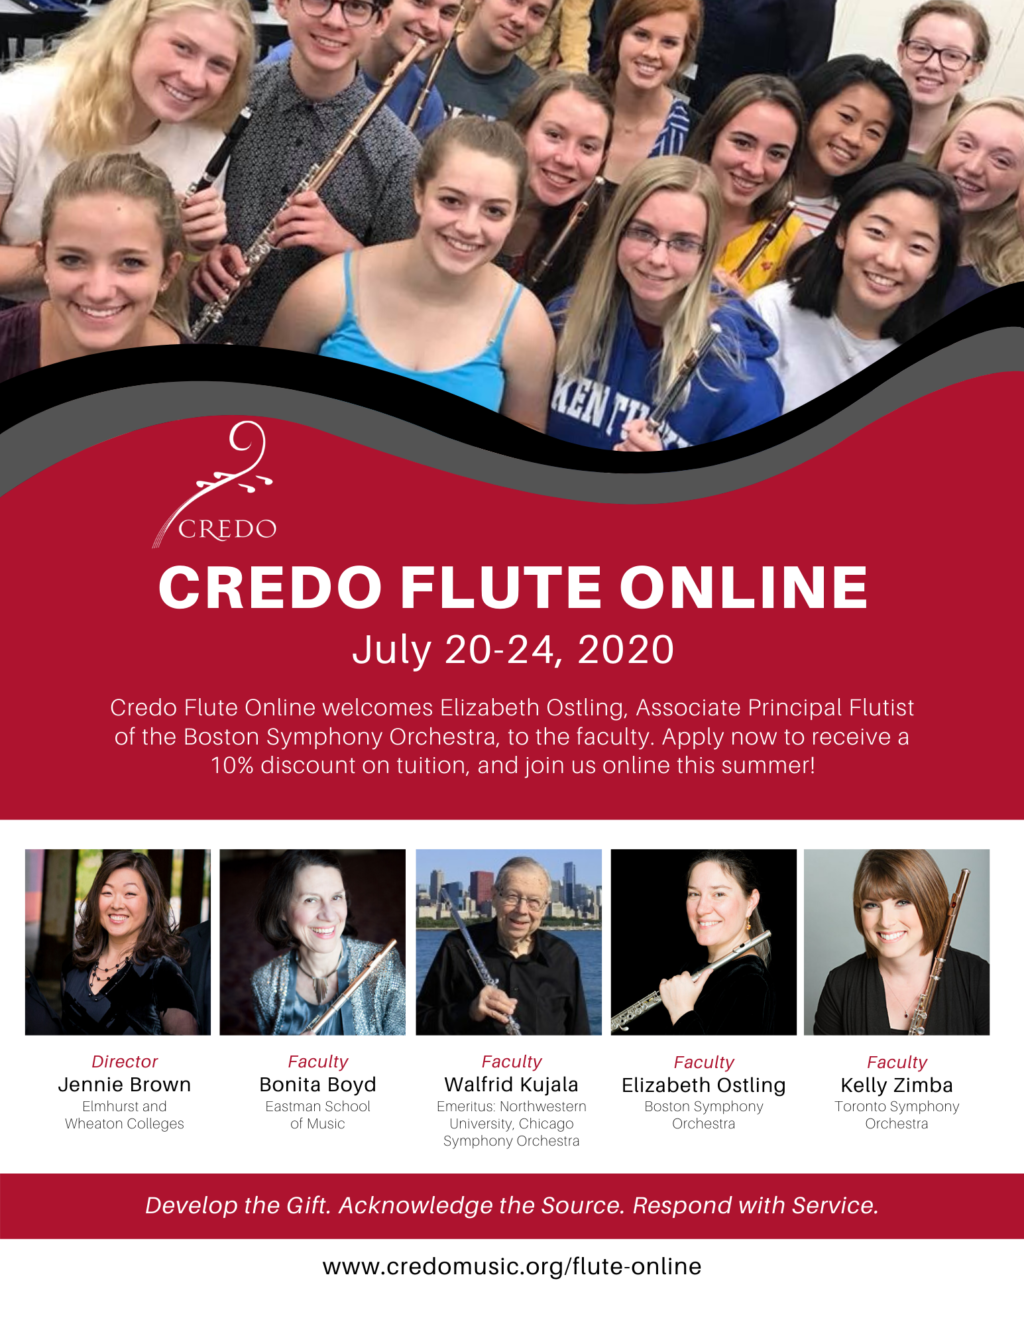 Credo Flute